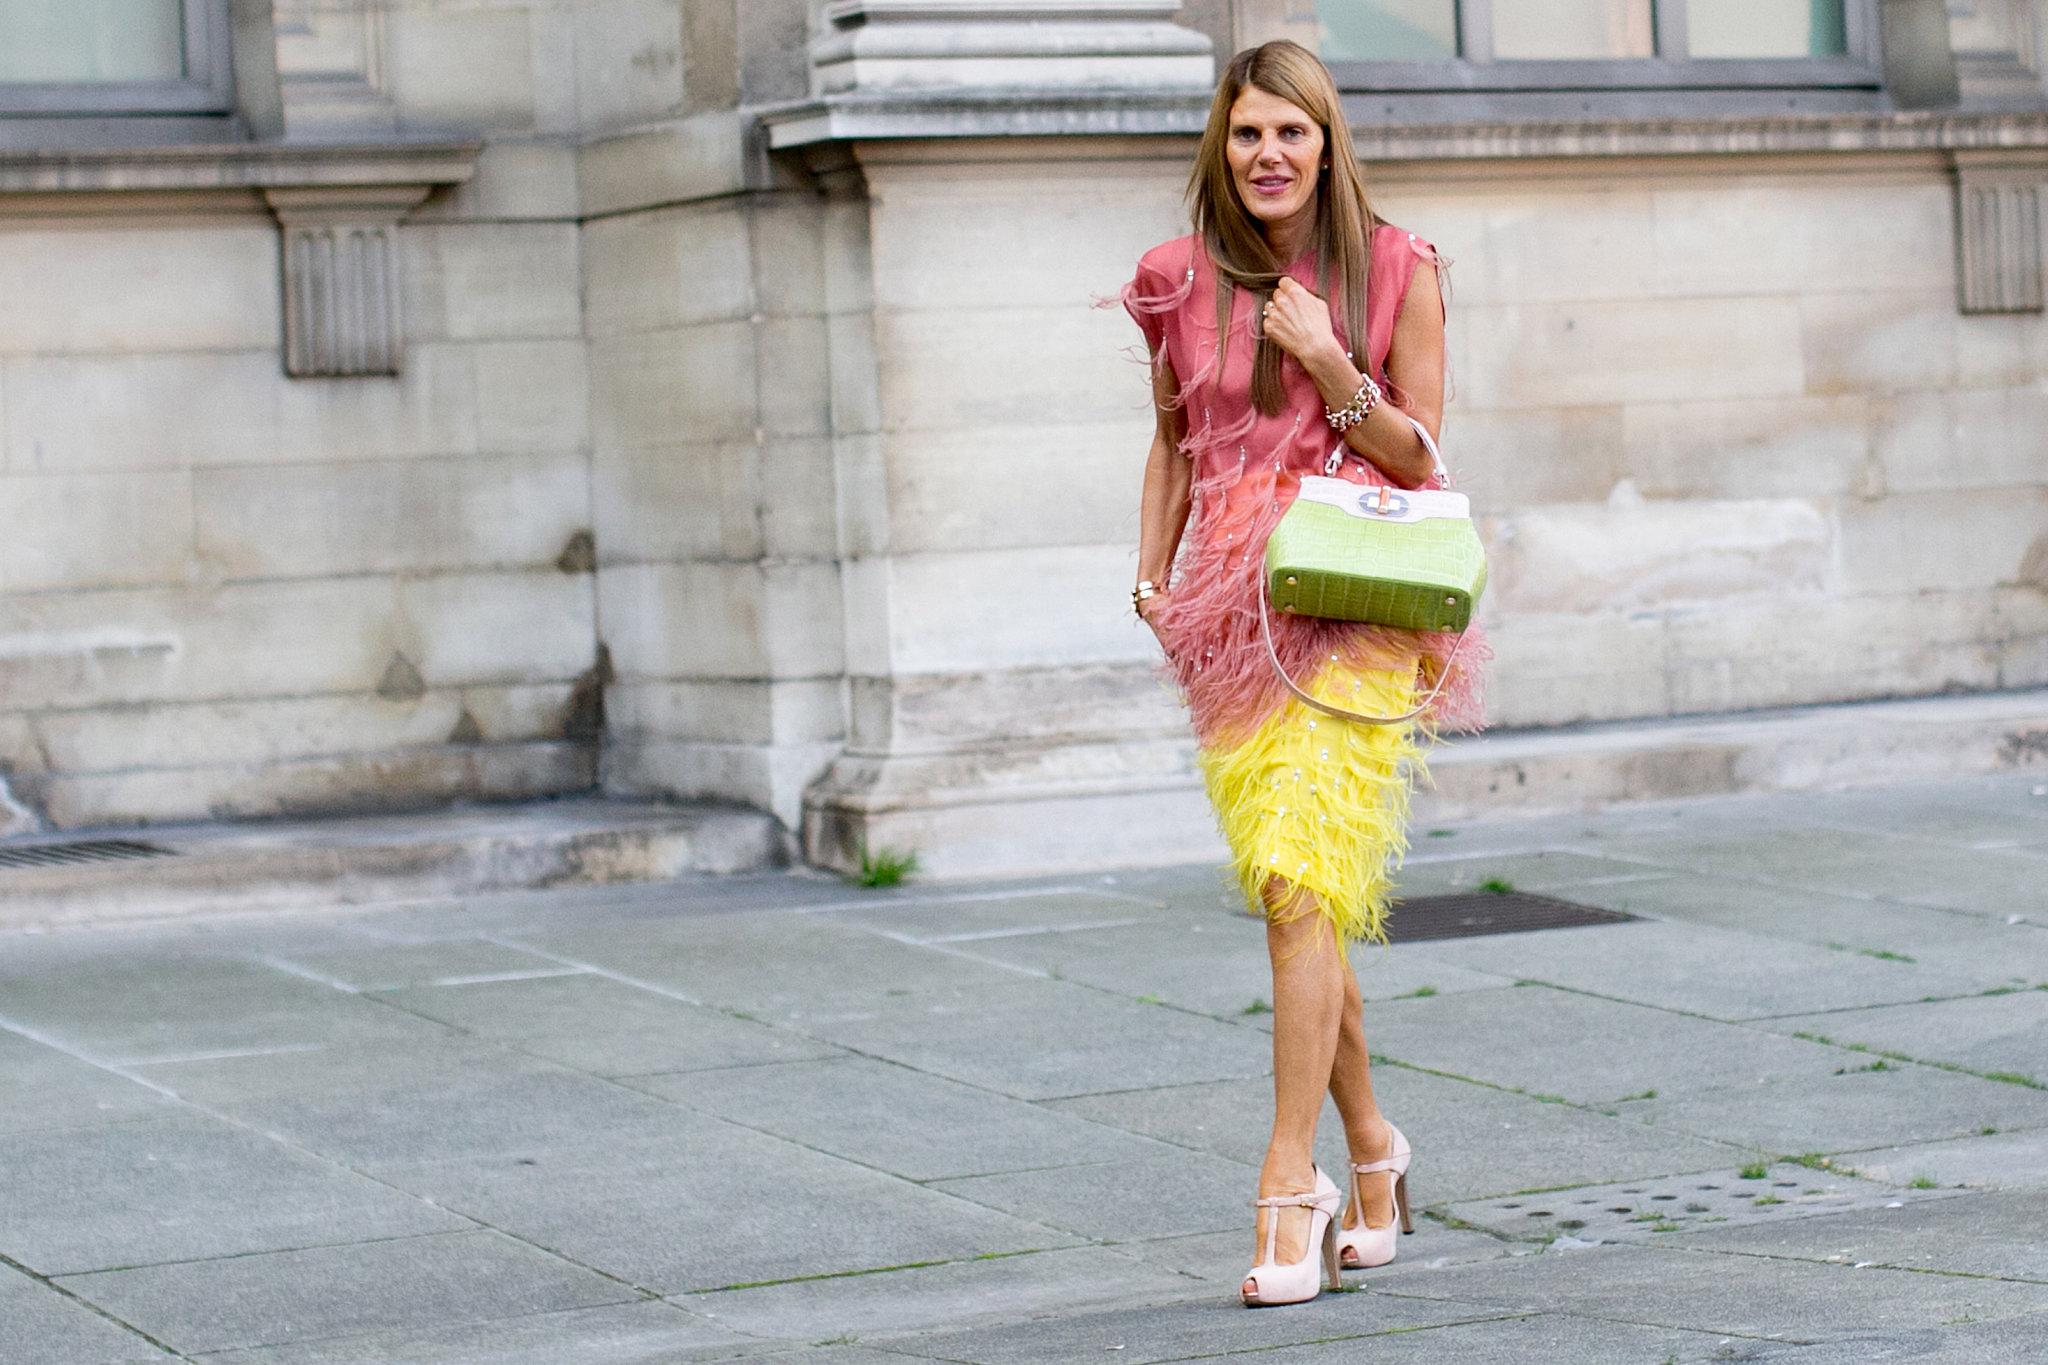 anna-dello-russo-ruled-sidewalk-multicolored-feathers.jpg